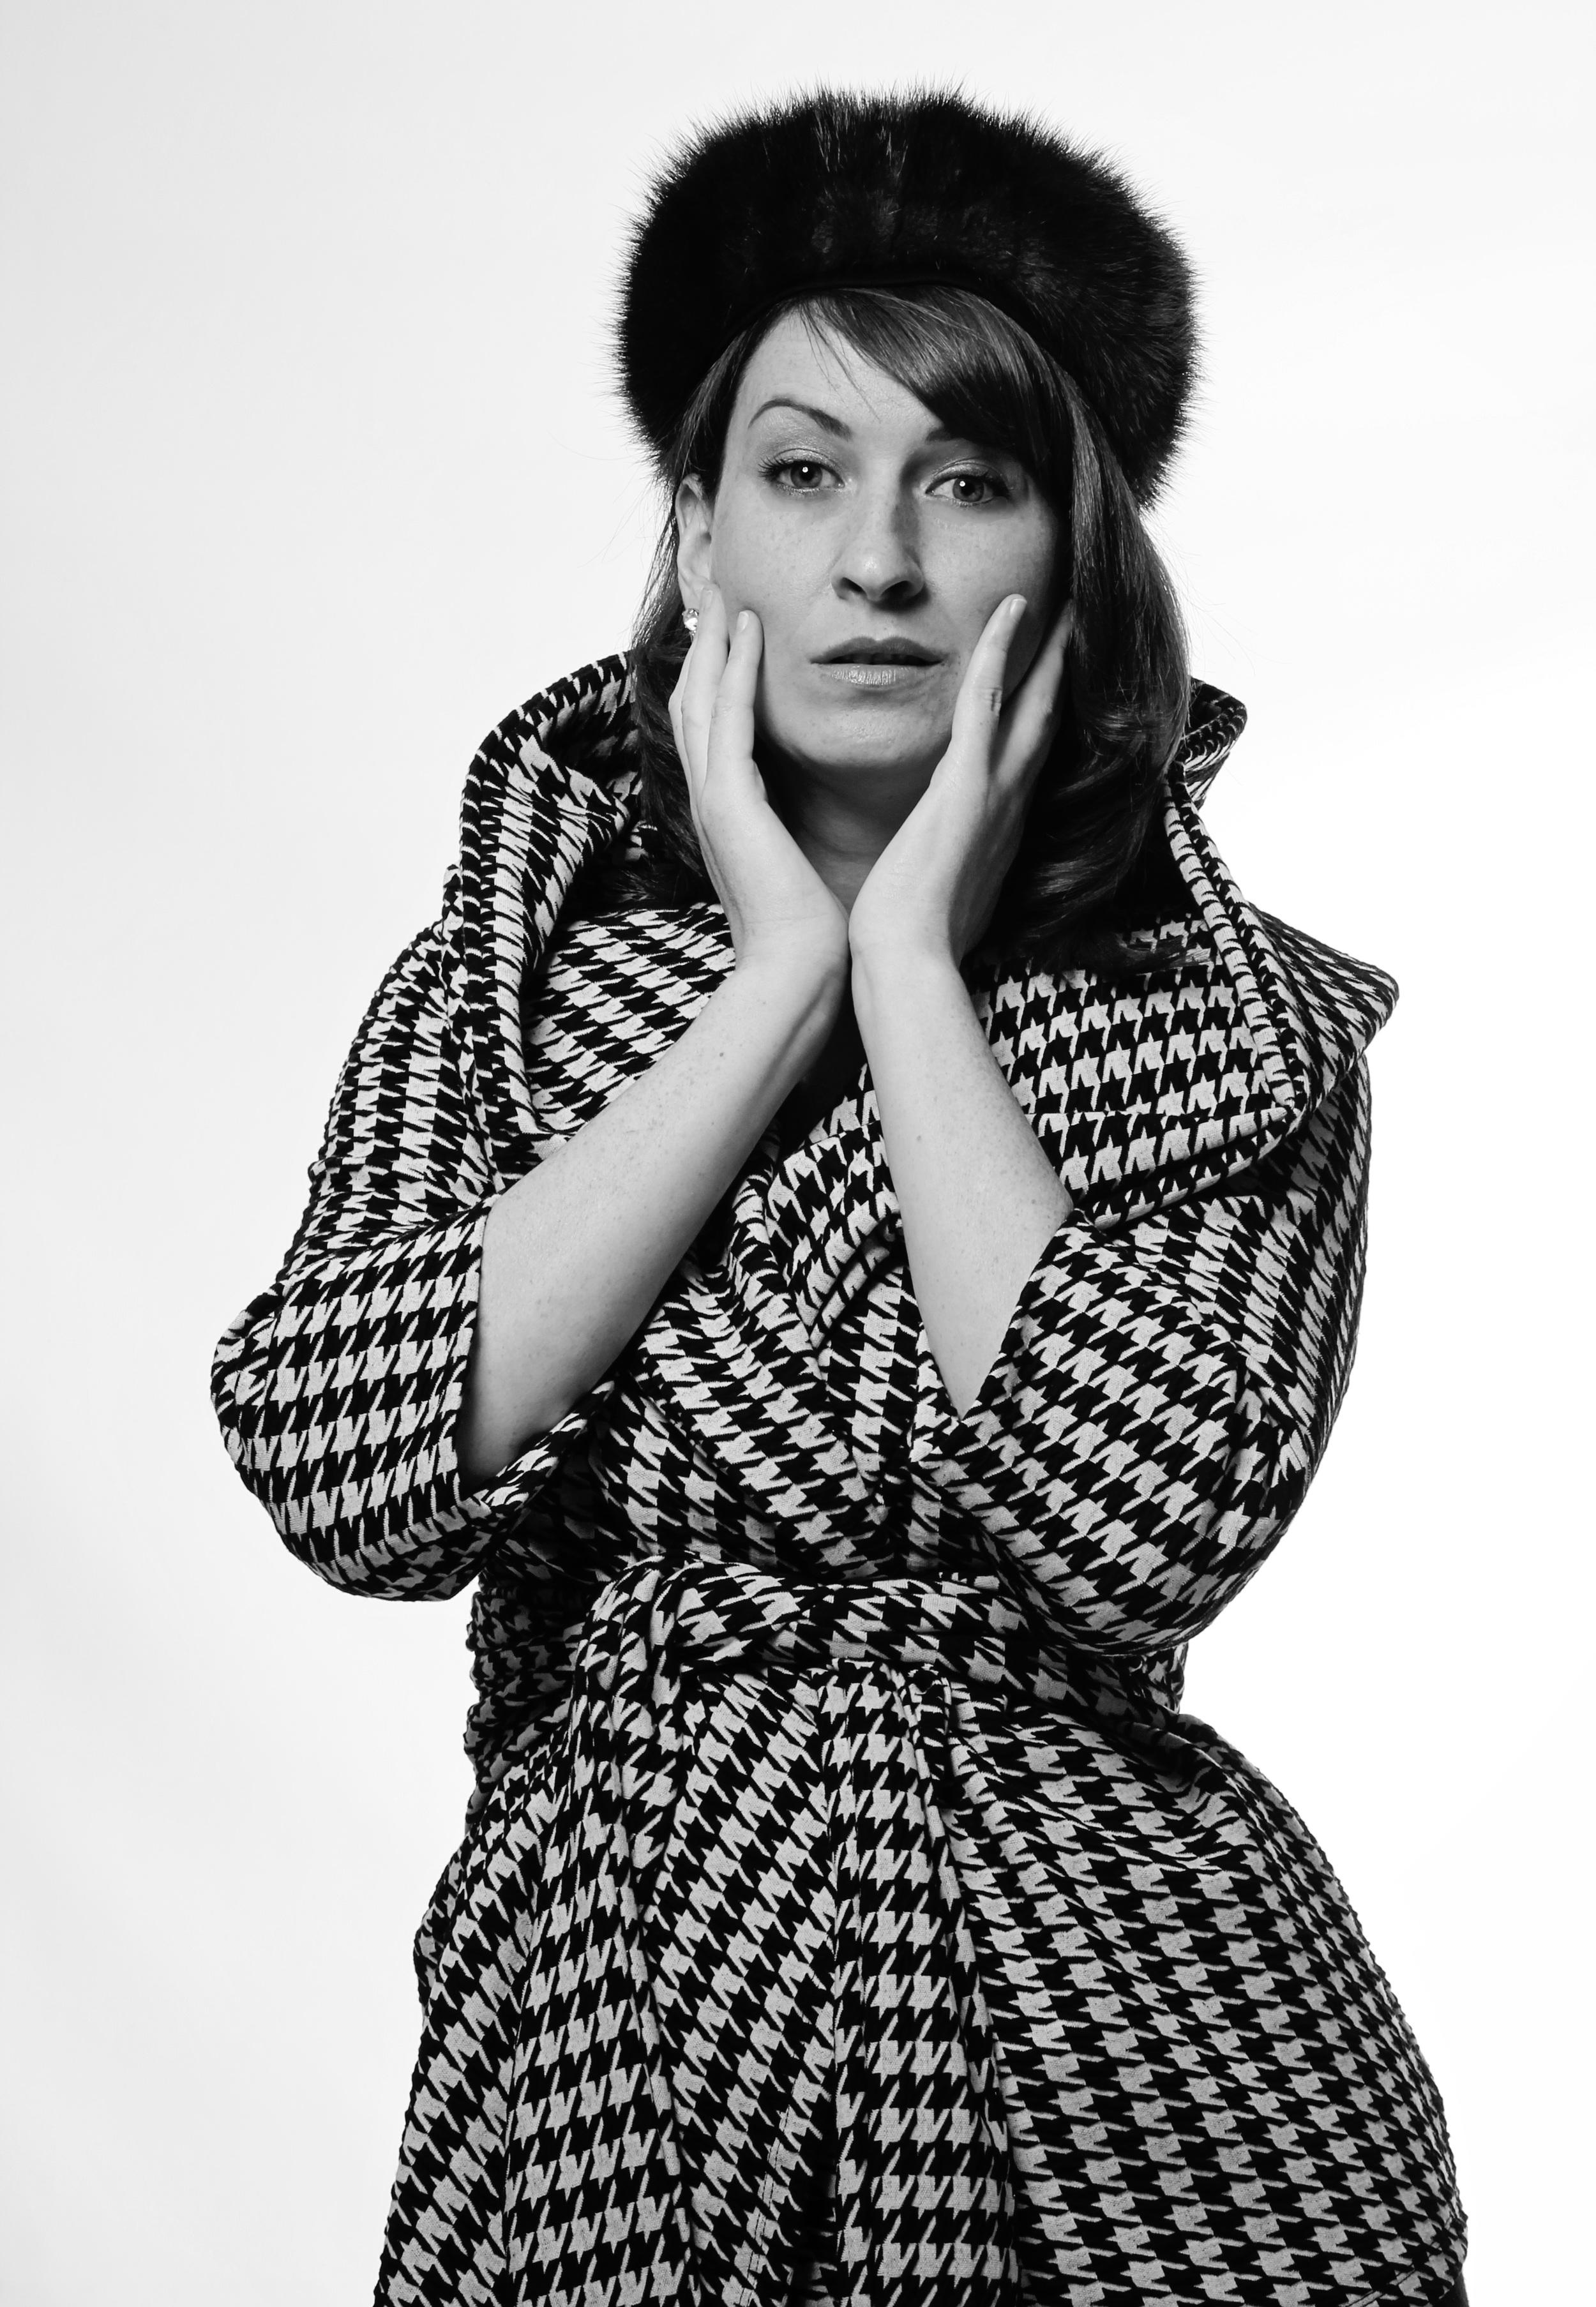 Project Houndstooth Model Jessica Stark